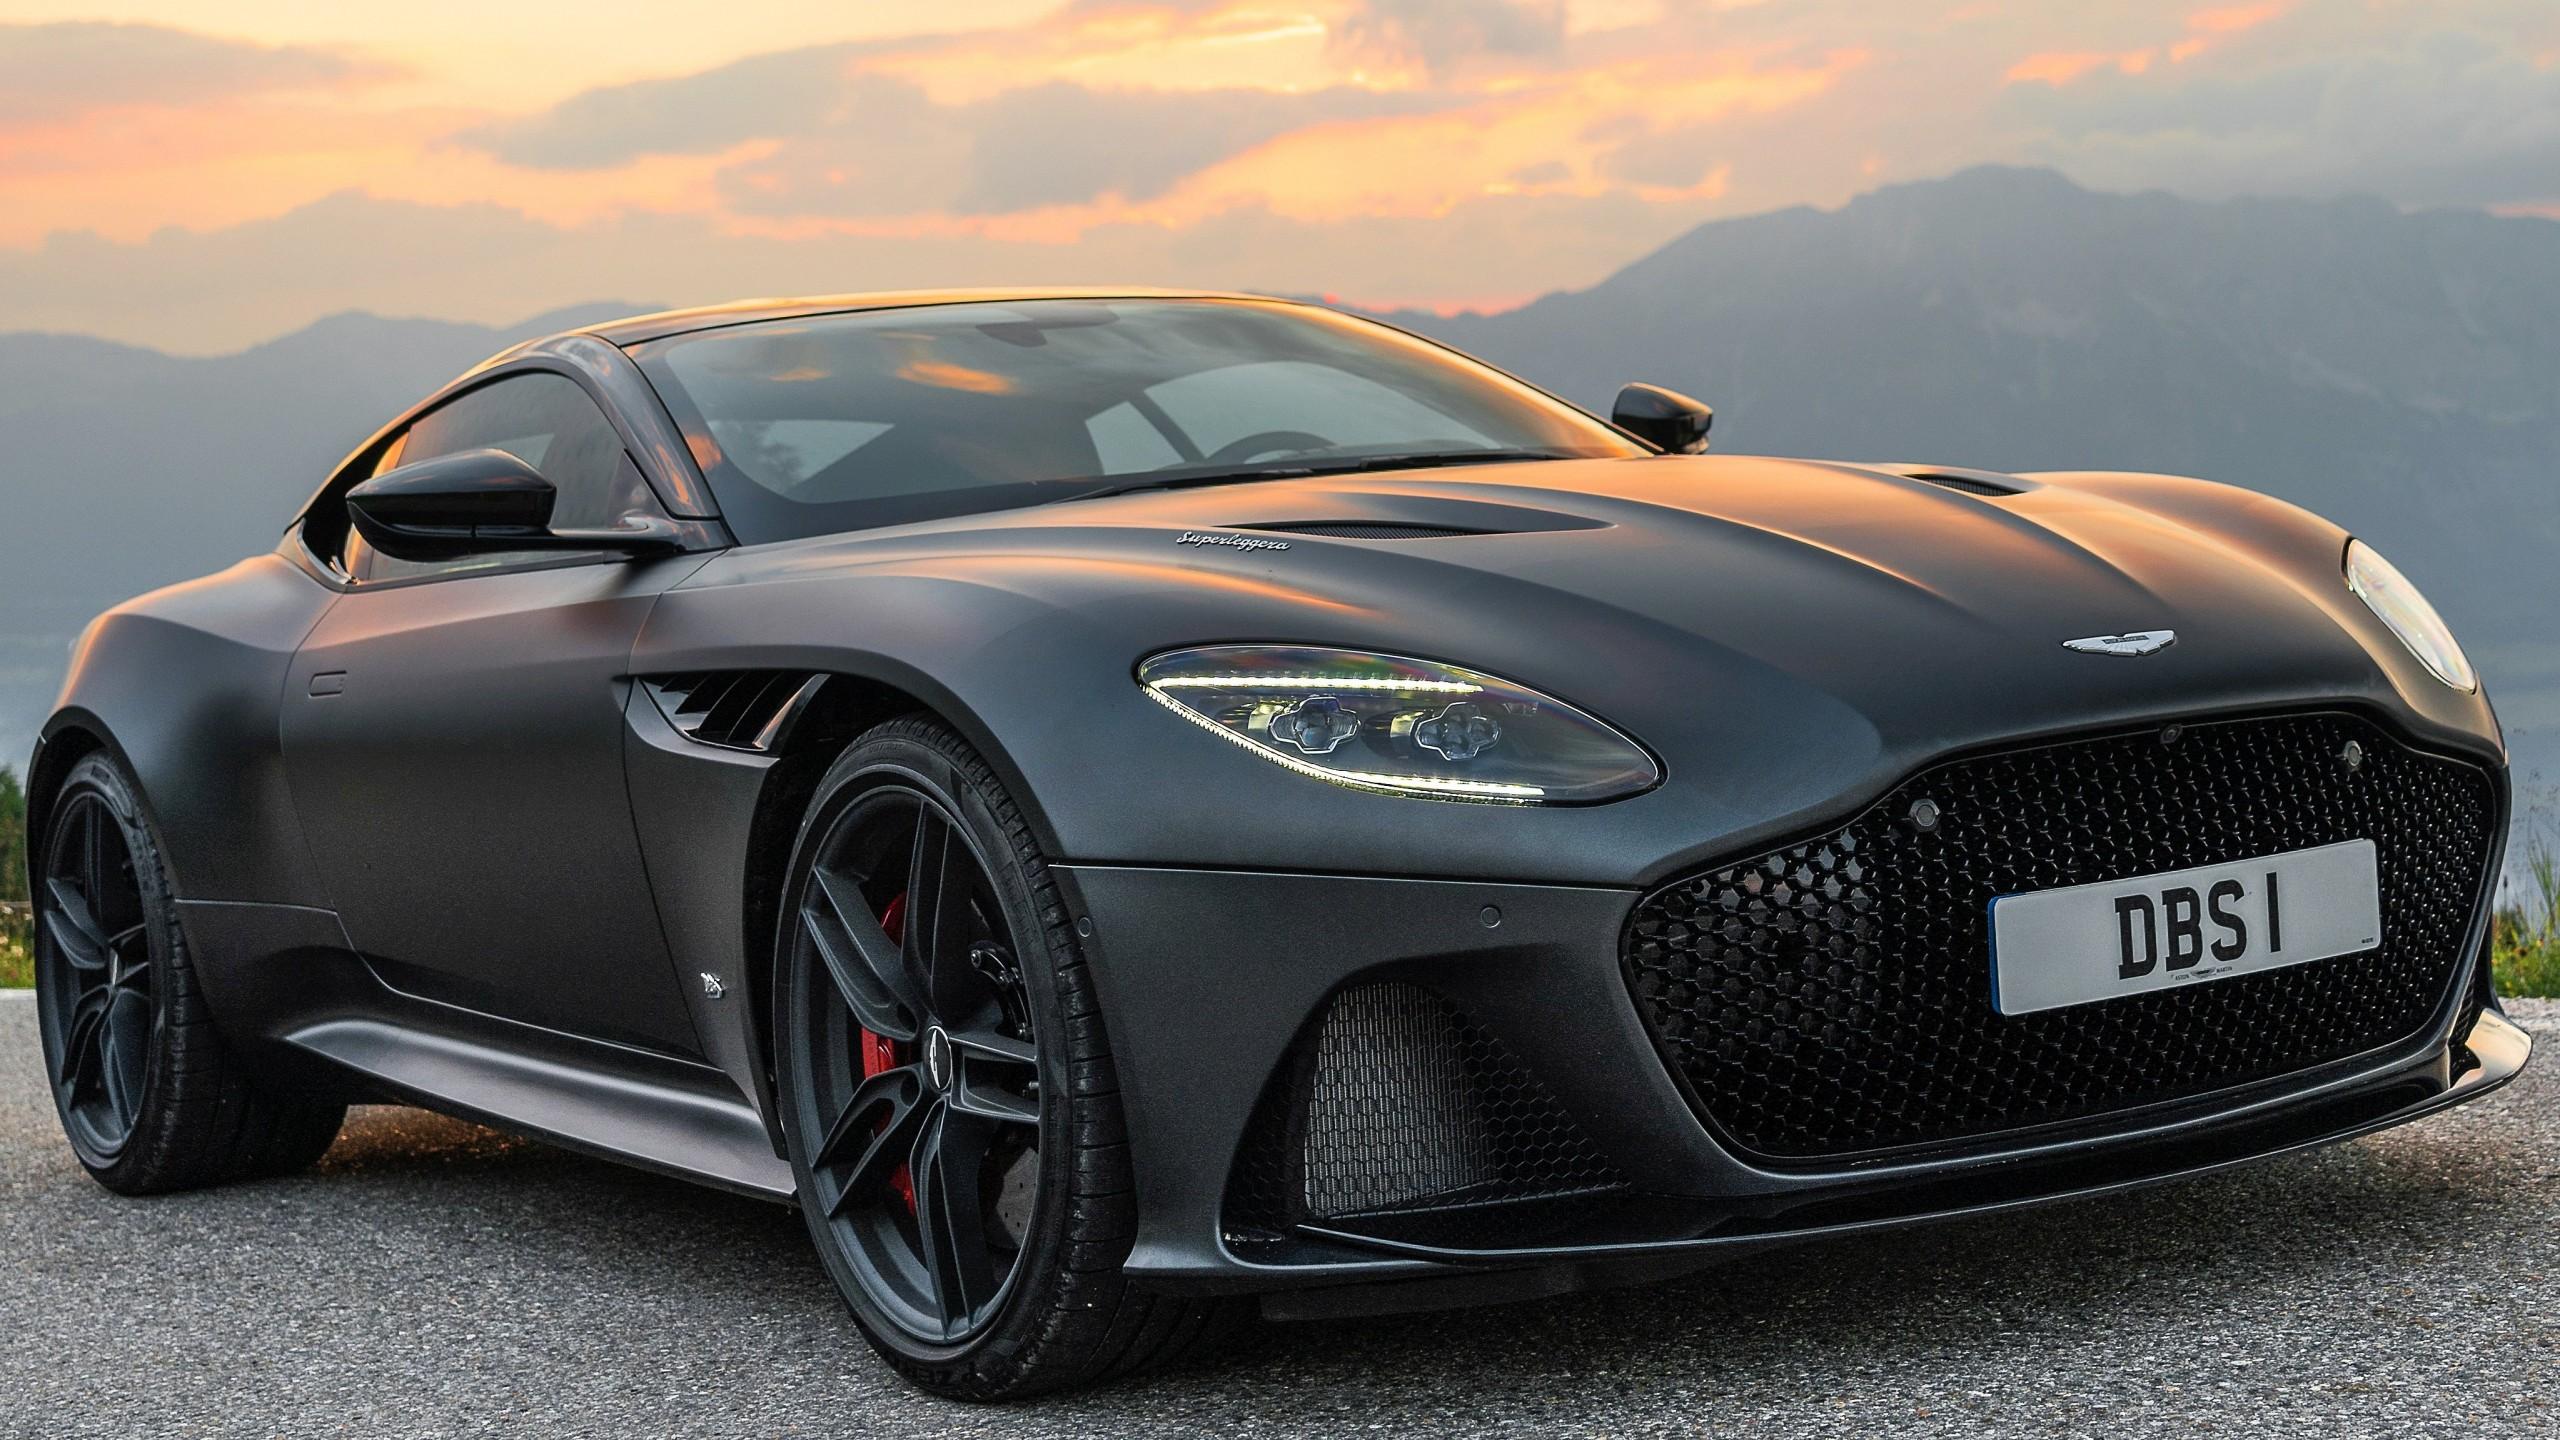 Aston Martin Dbs >> Wallpaper Aston Martin DBS Superleggera, 2019 Cars, 4K ...